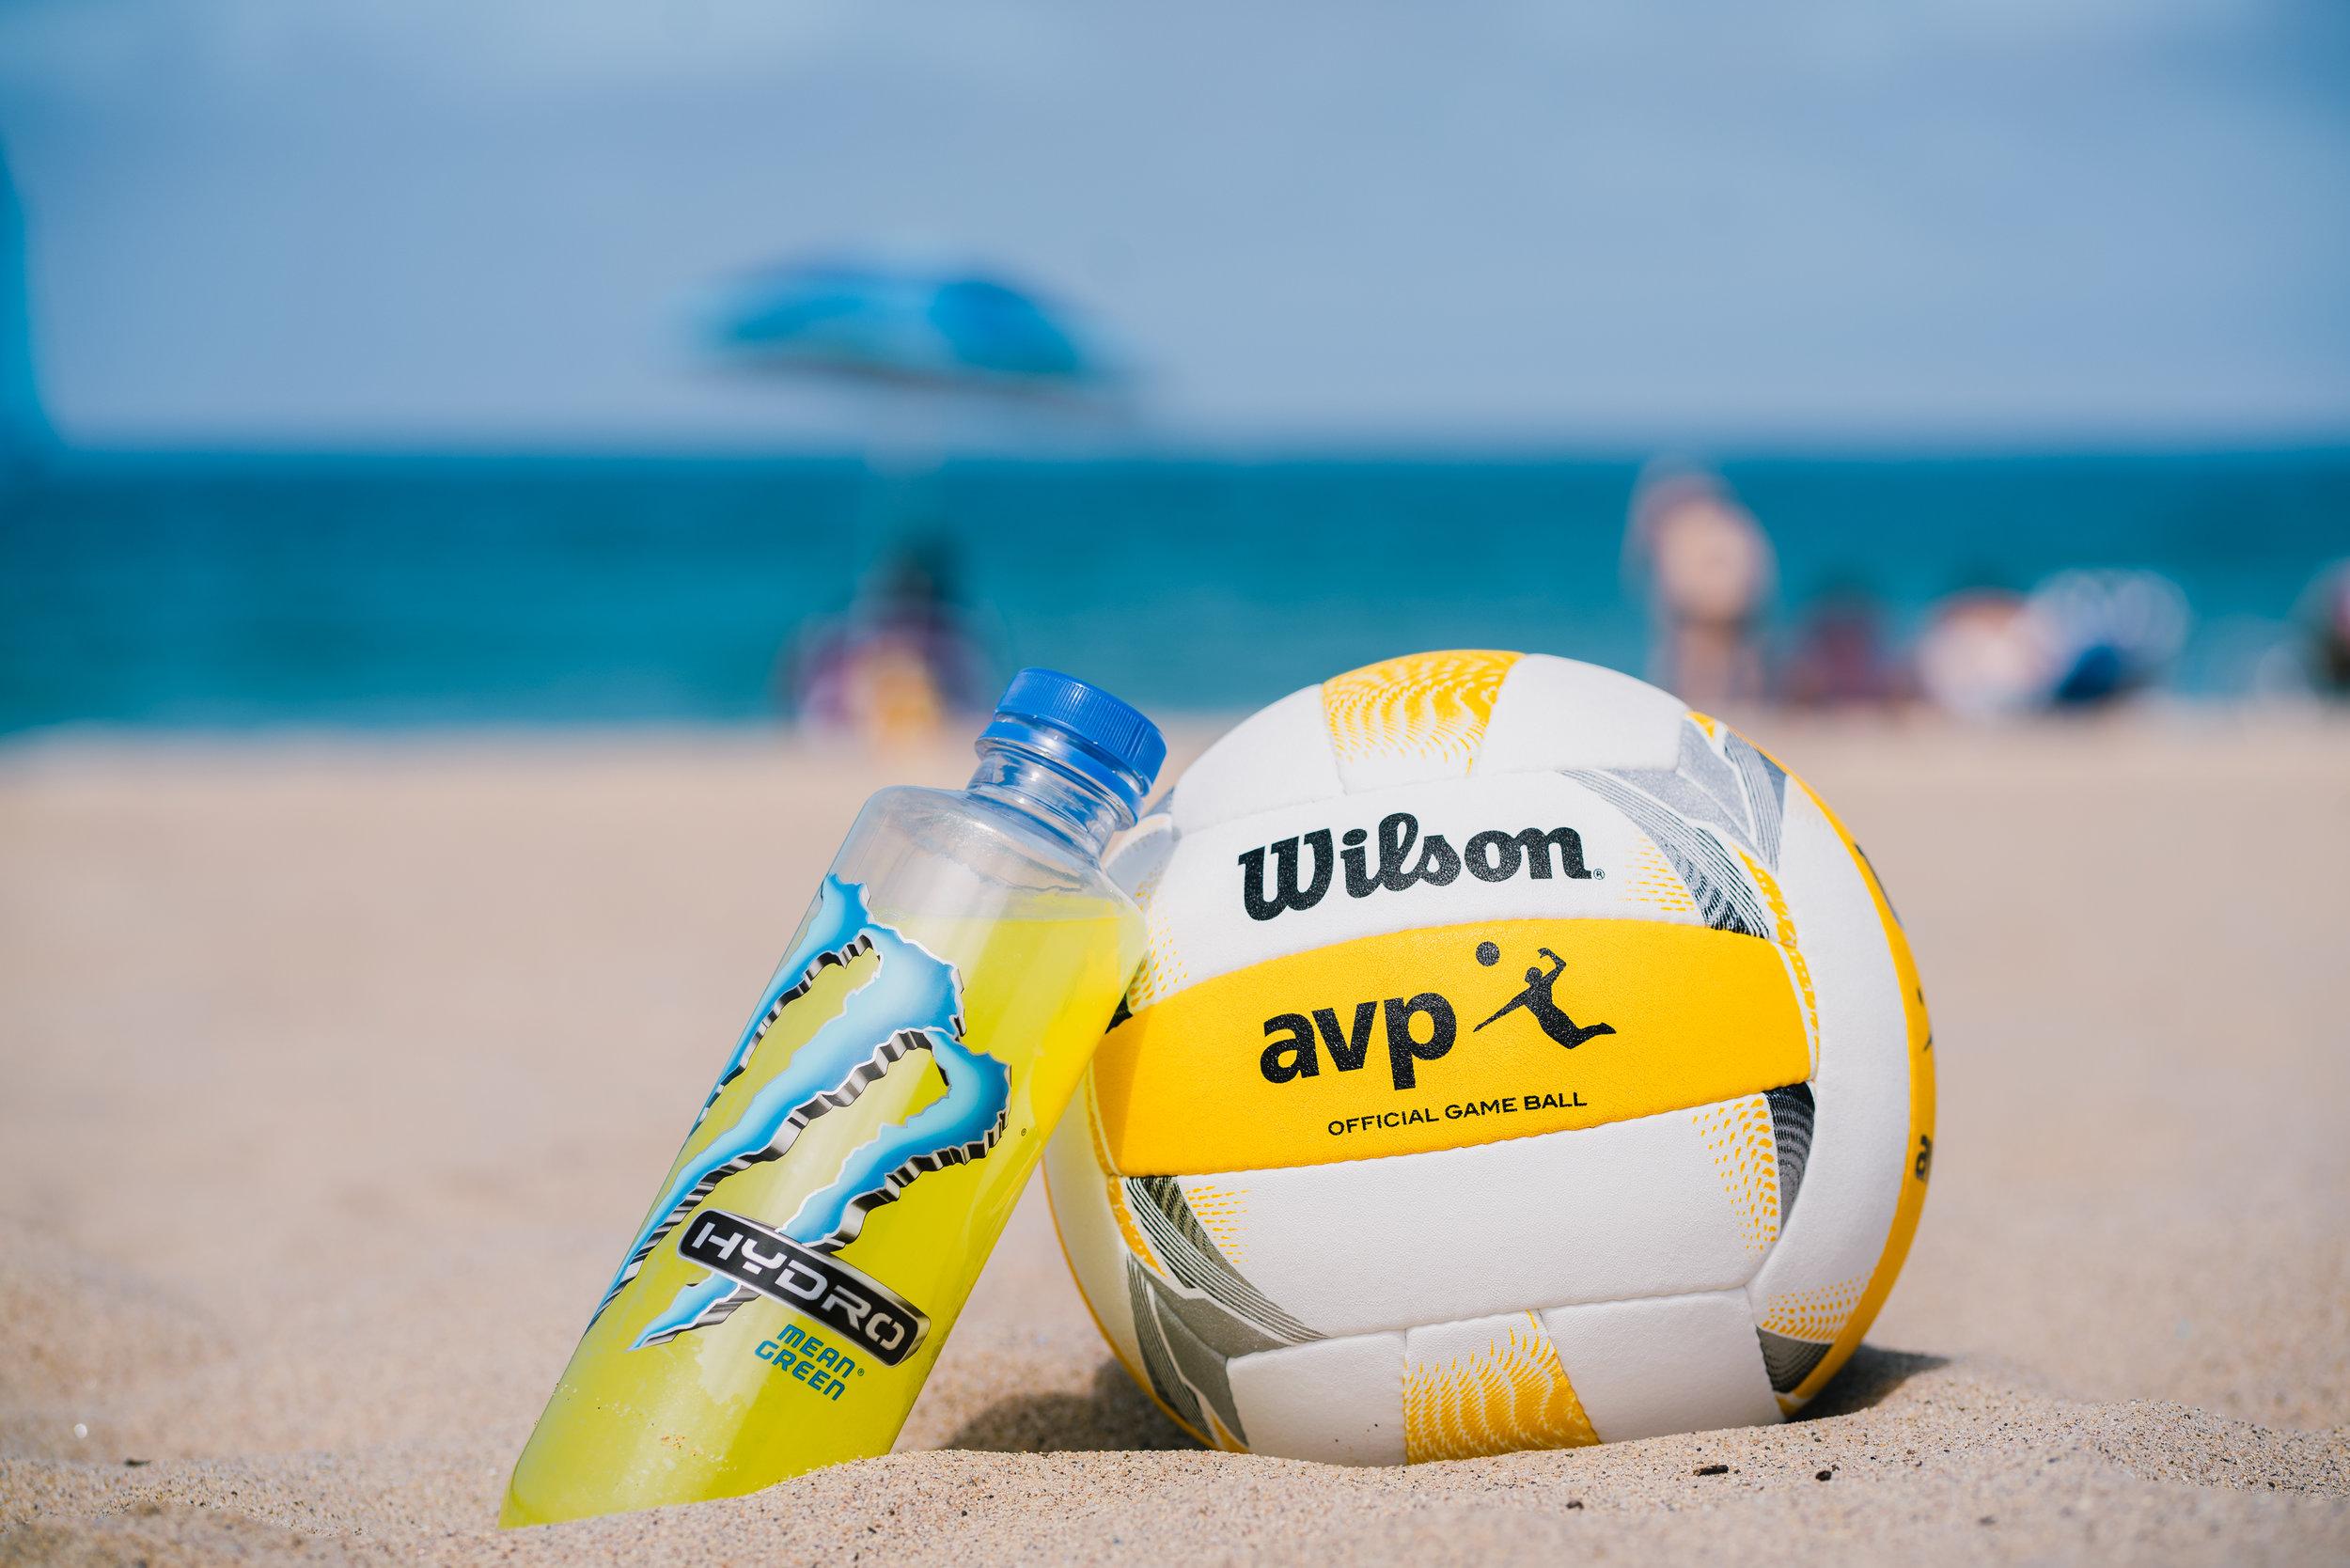 AVP Volleyball July 28 Large-10.jpg